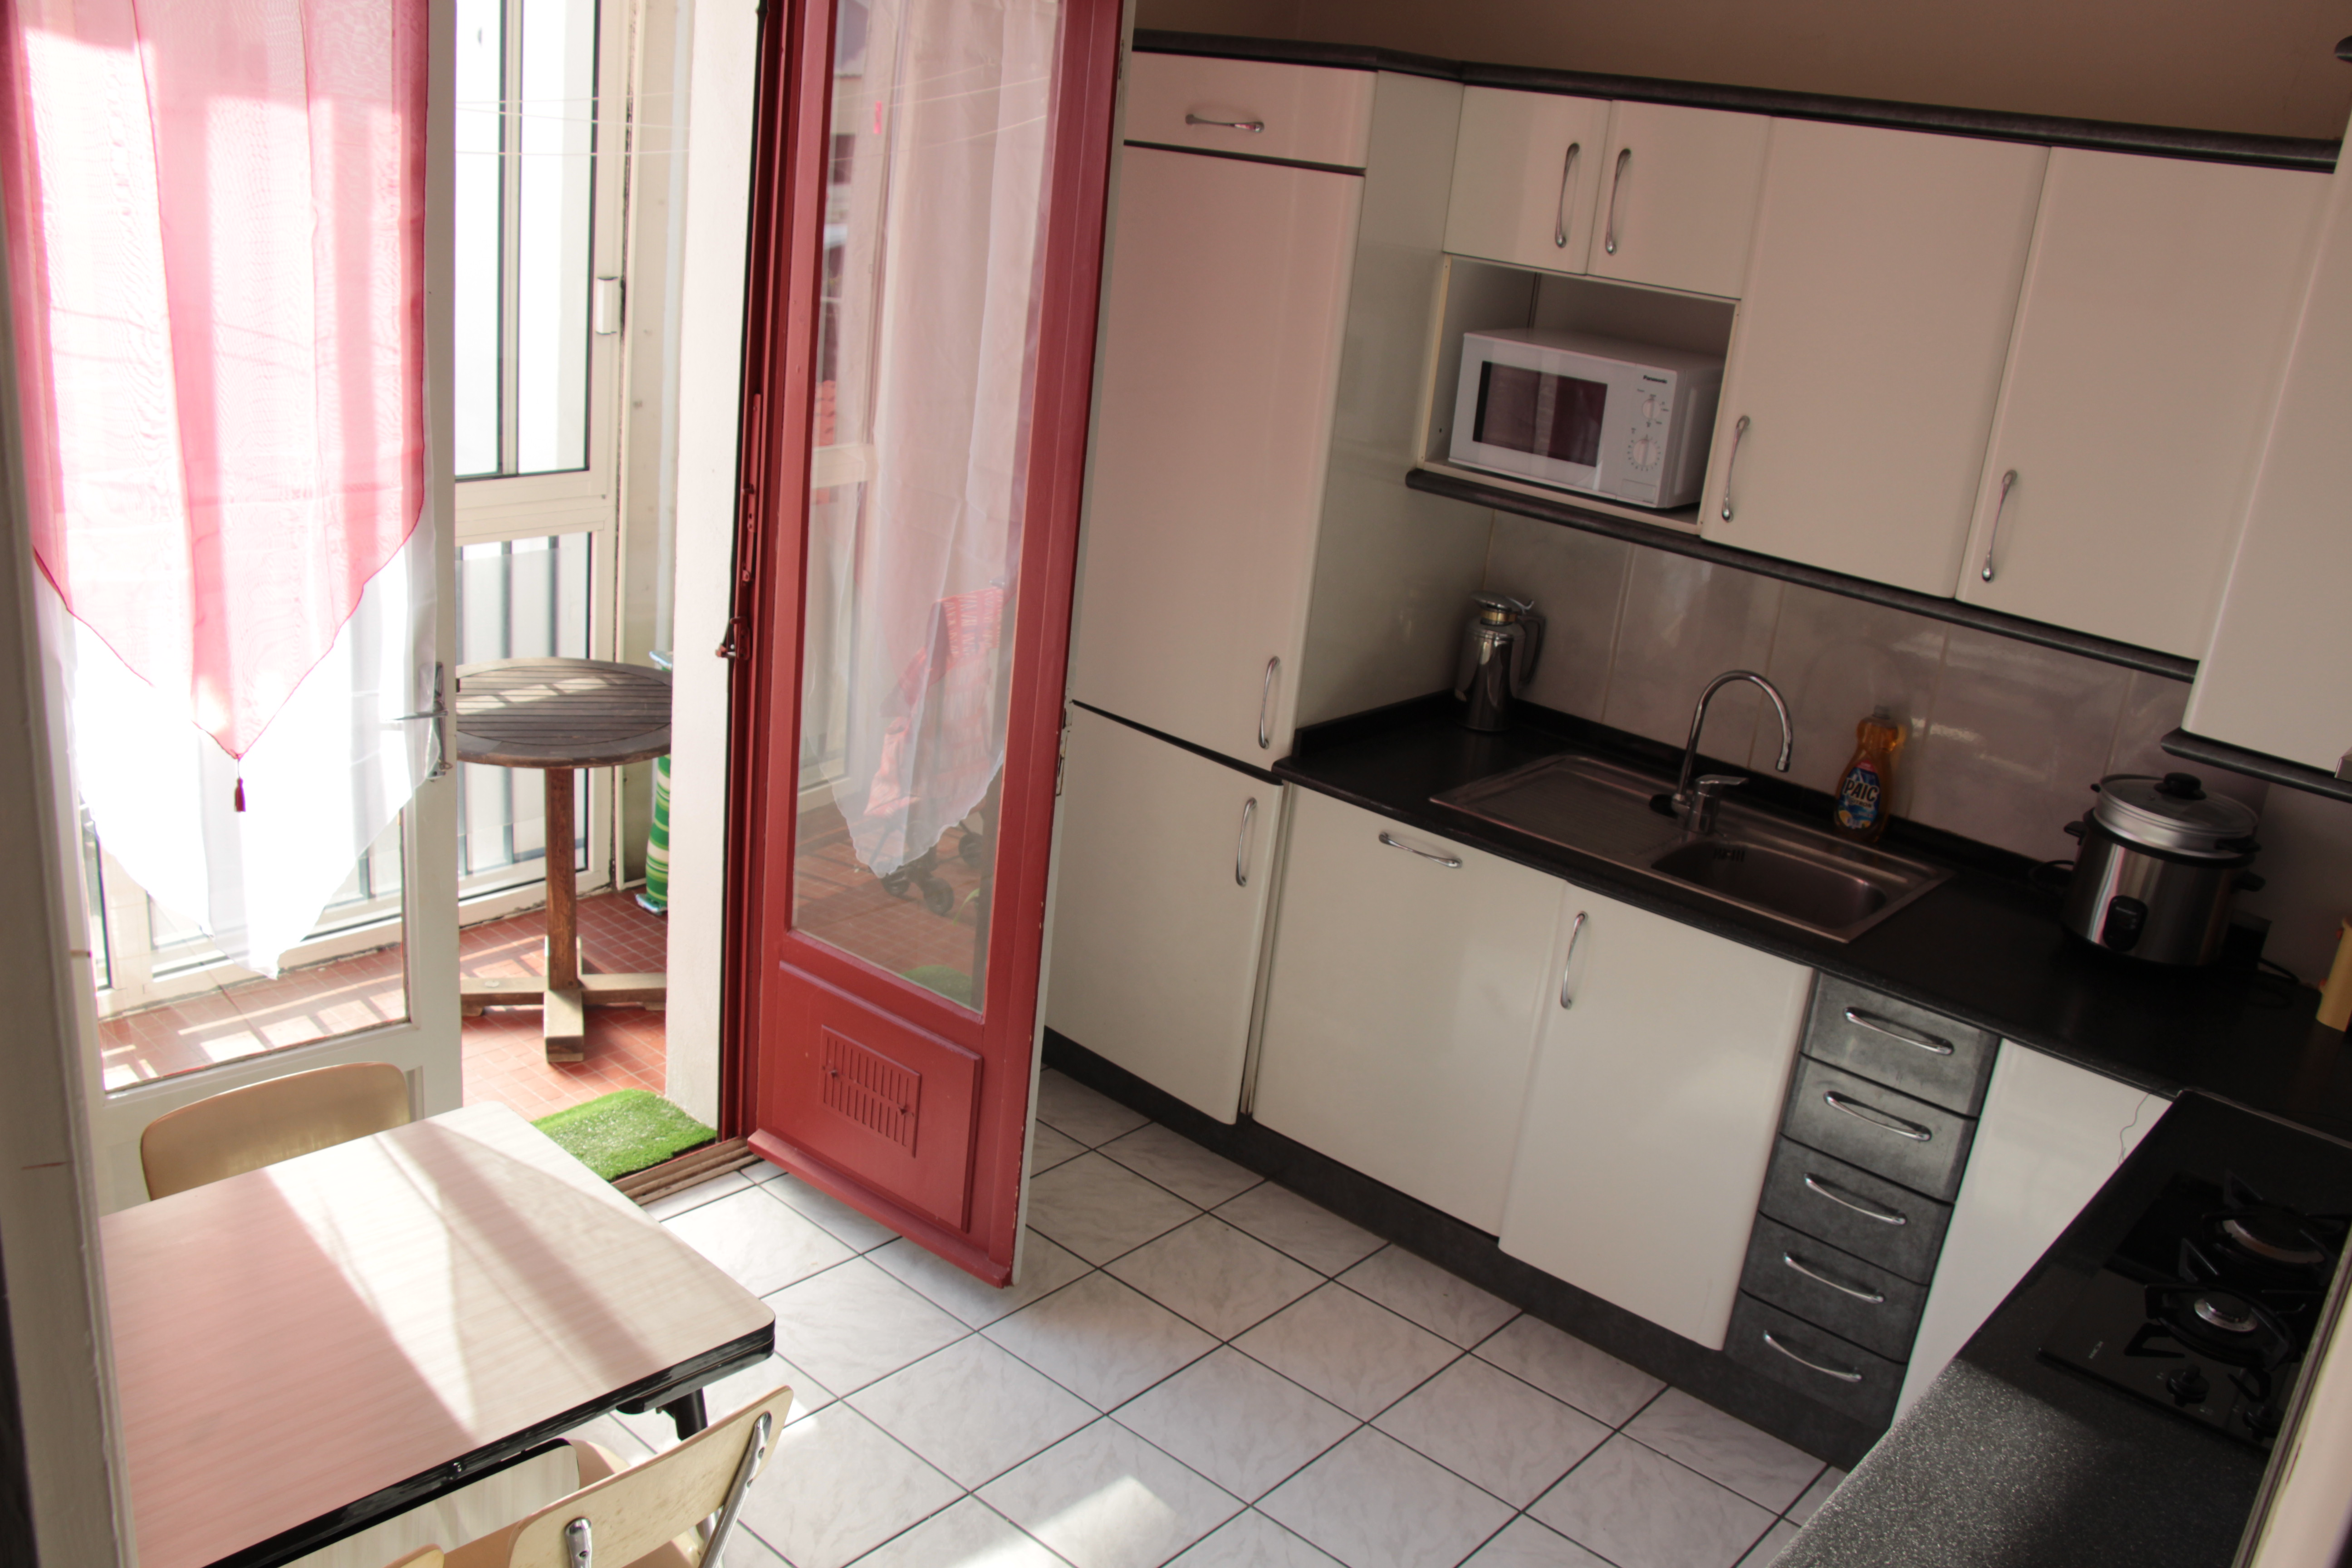 appartement hendaye louer pour 8 personnes location n 63589. Black Bedroom Furniture Sets. Home Design Ideas